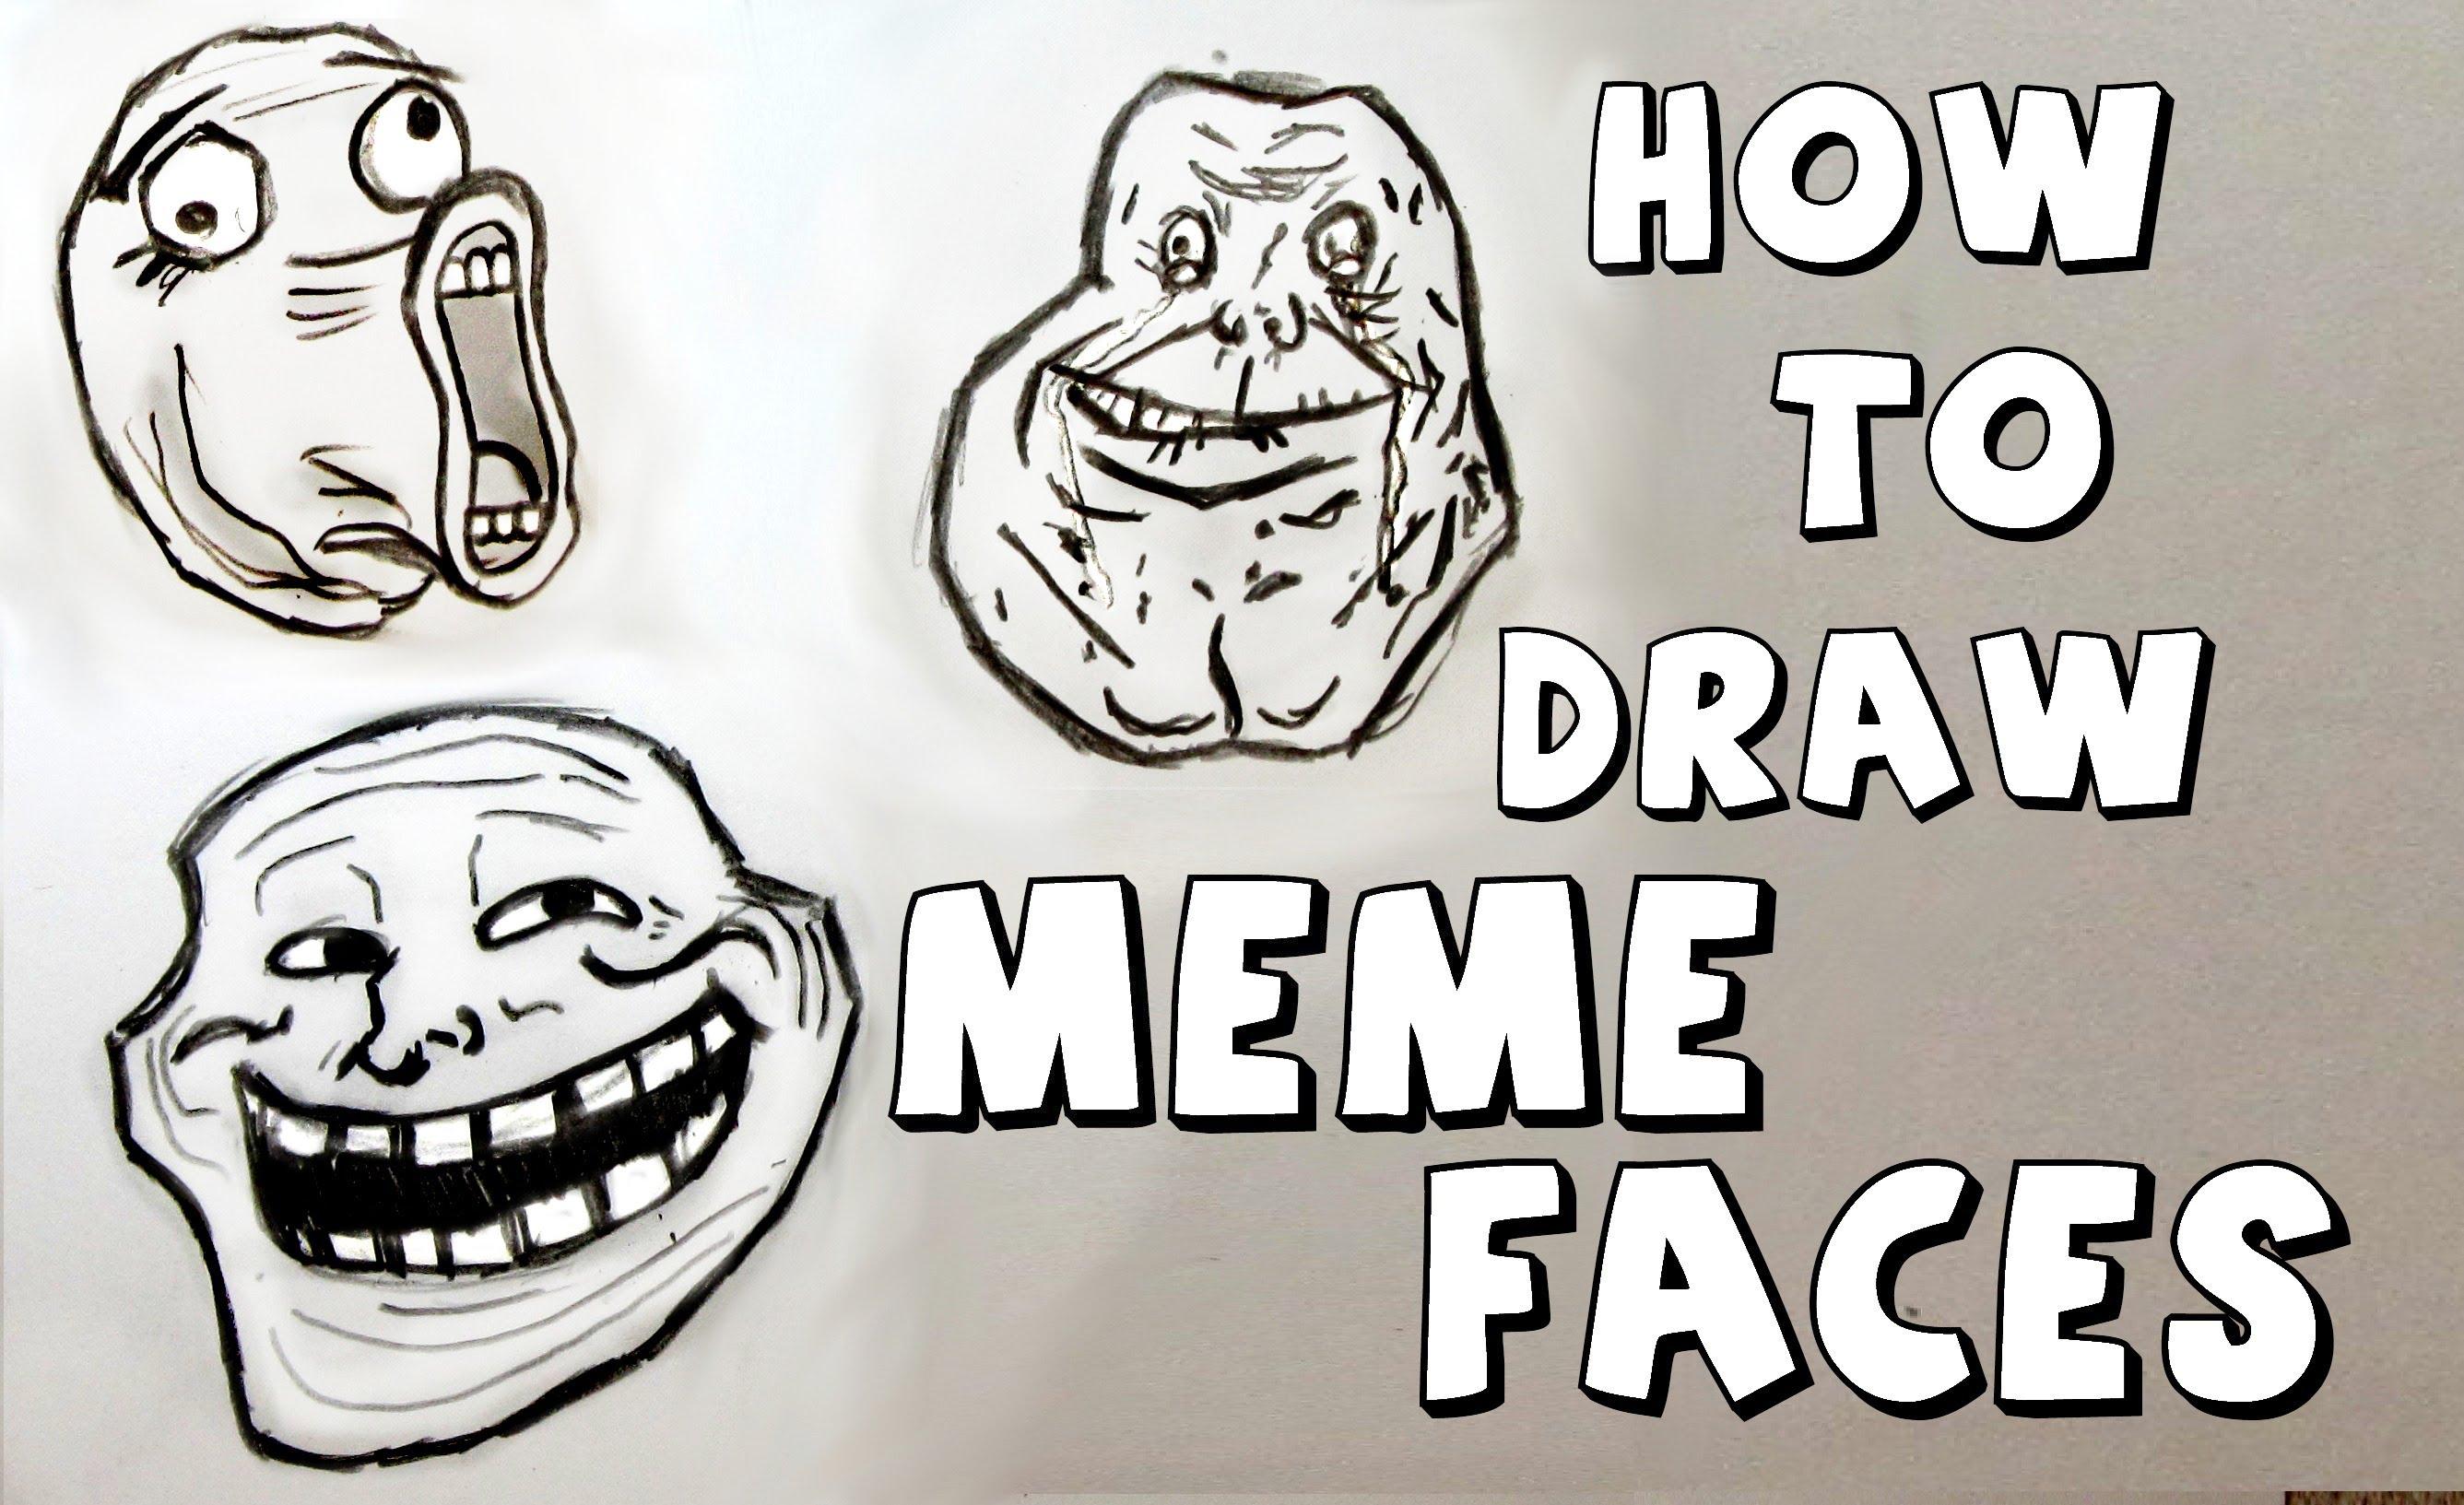 Jerry Meme Face By Voredude234 On Deviantart